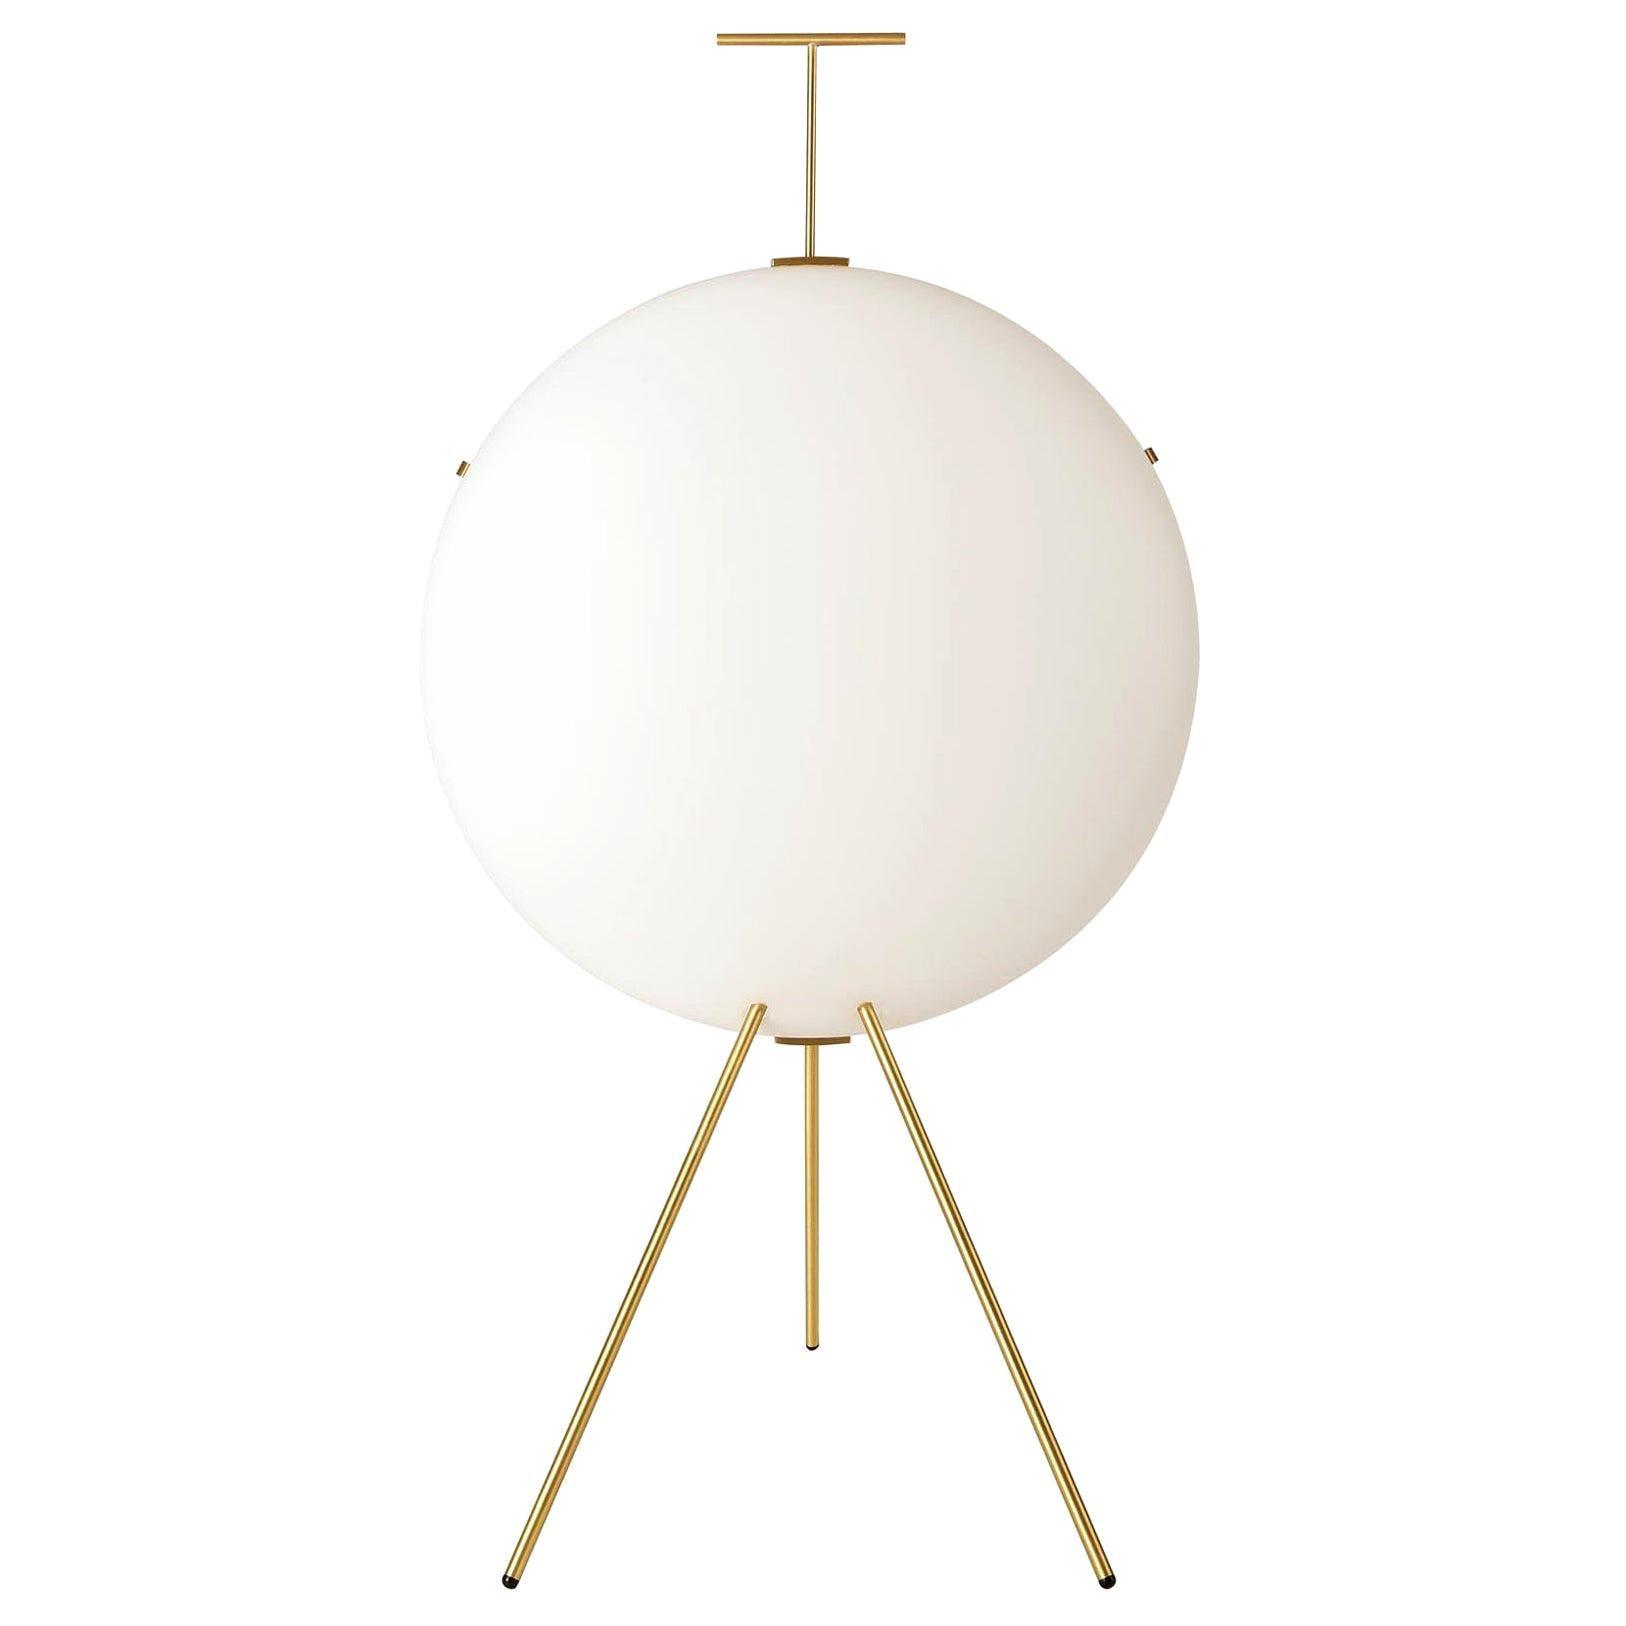 Gio Ponti Luna Verticale Floor Lamp in Brass